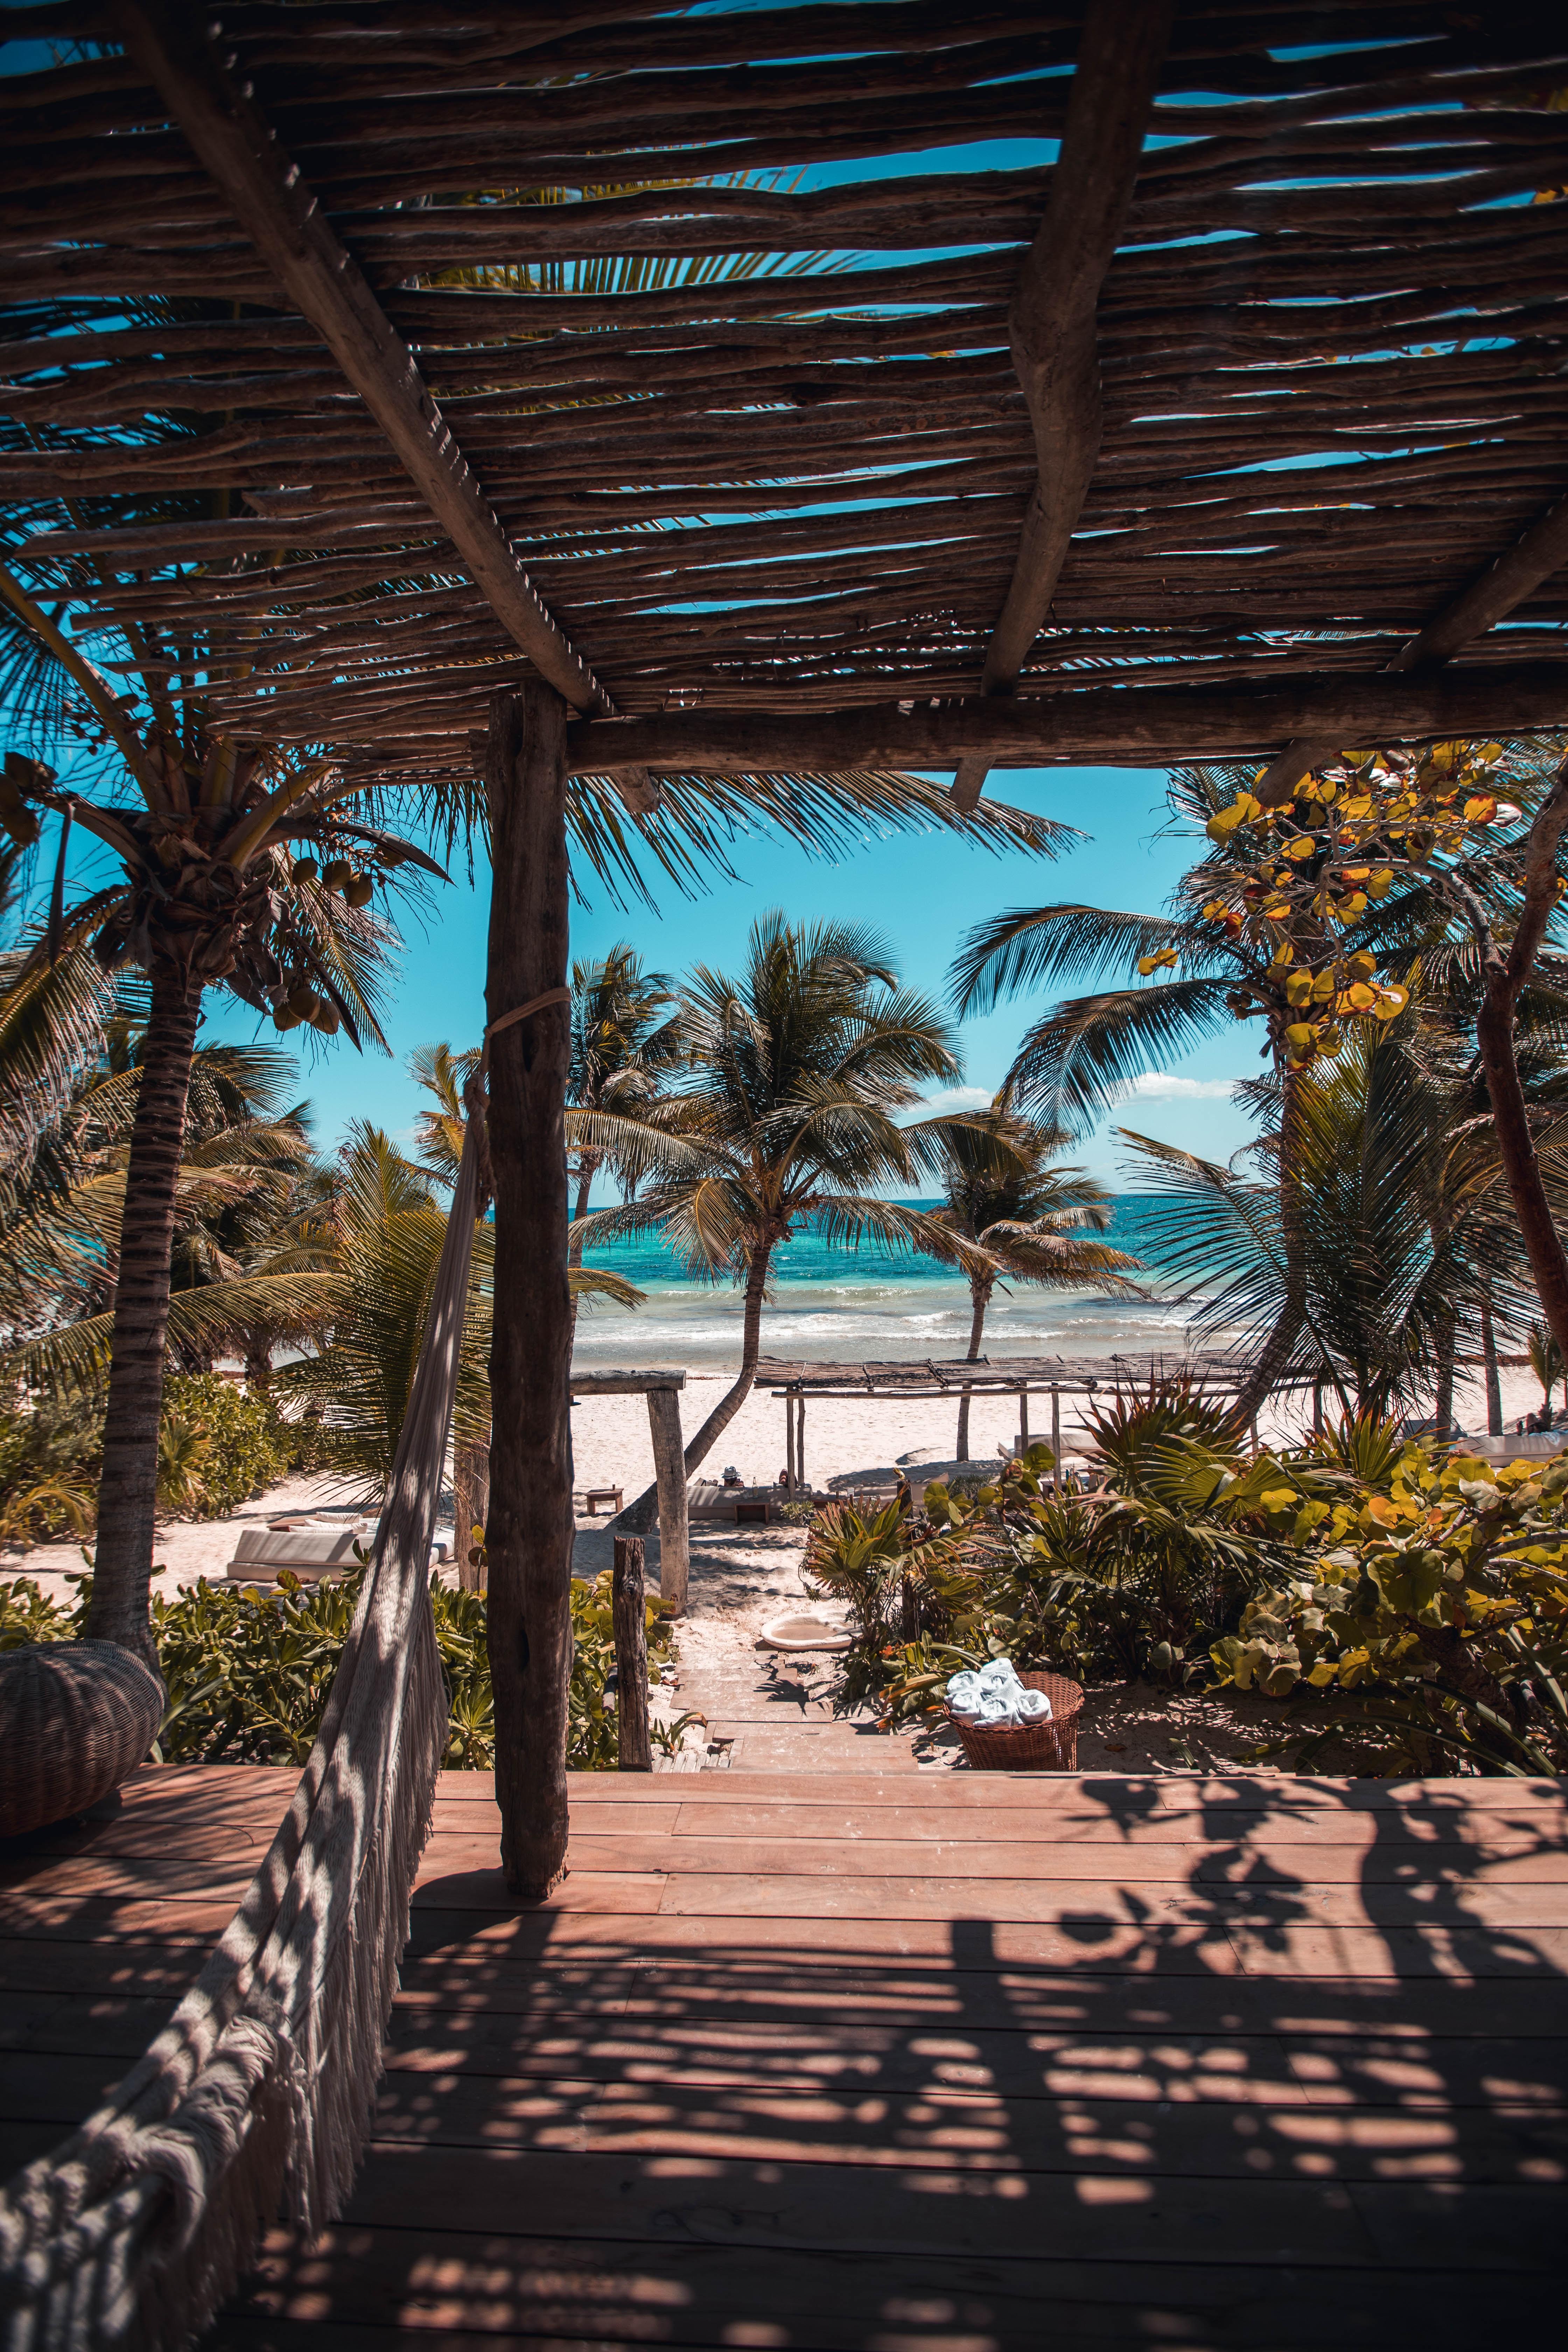 nipa hut under coconut palm trees